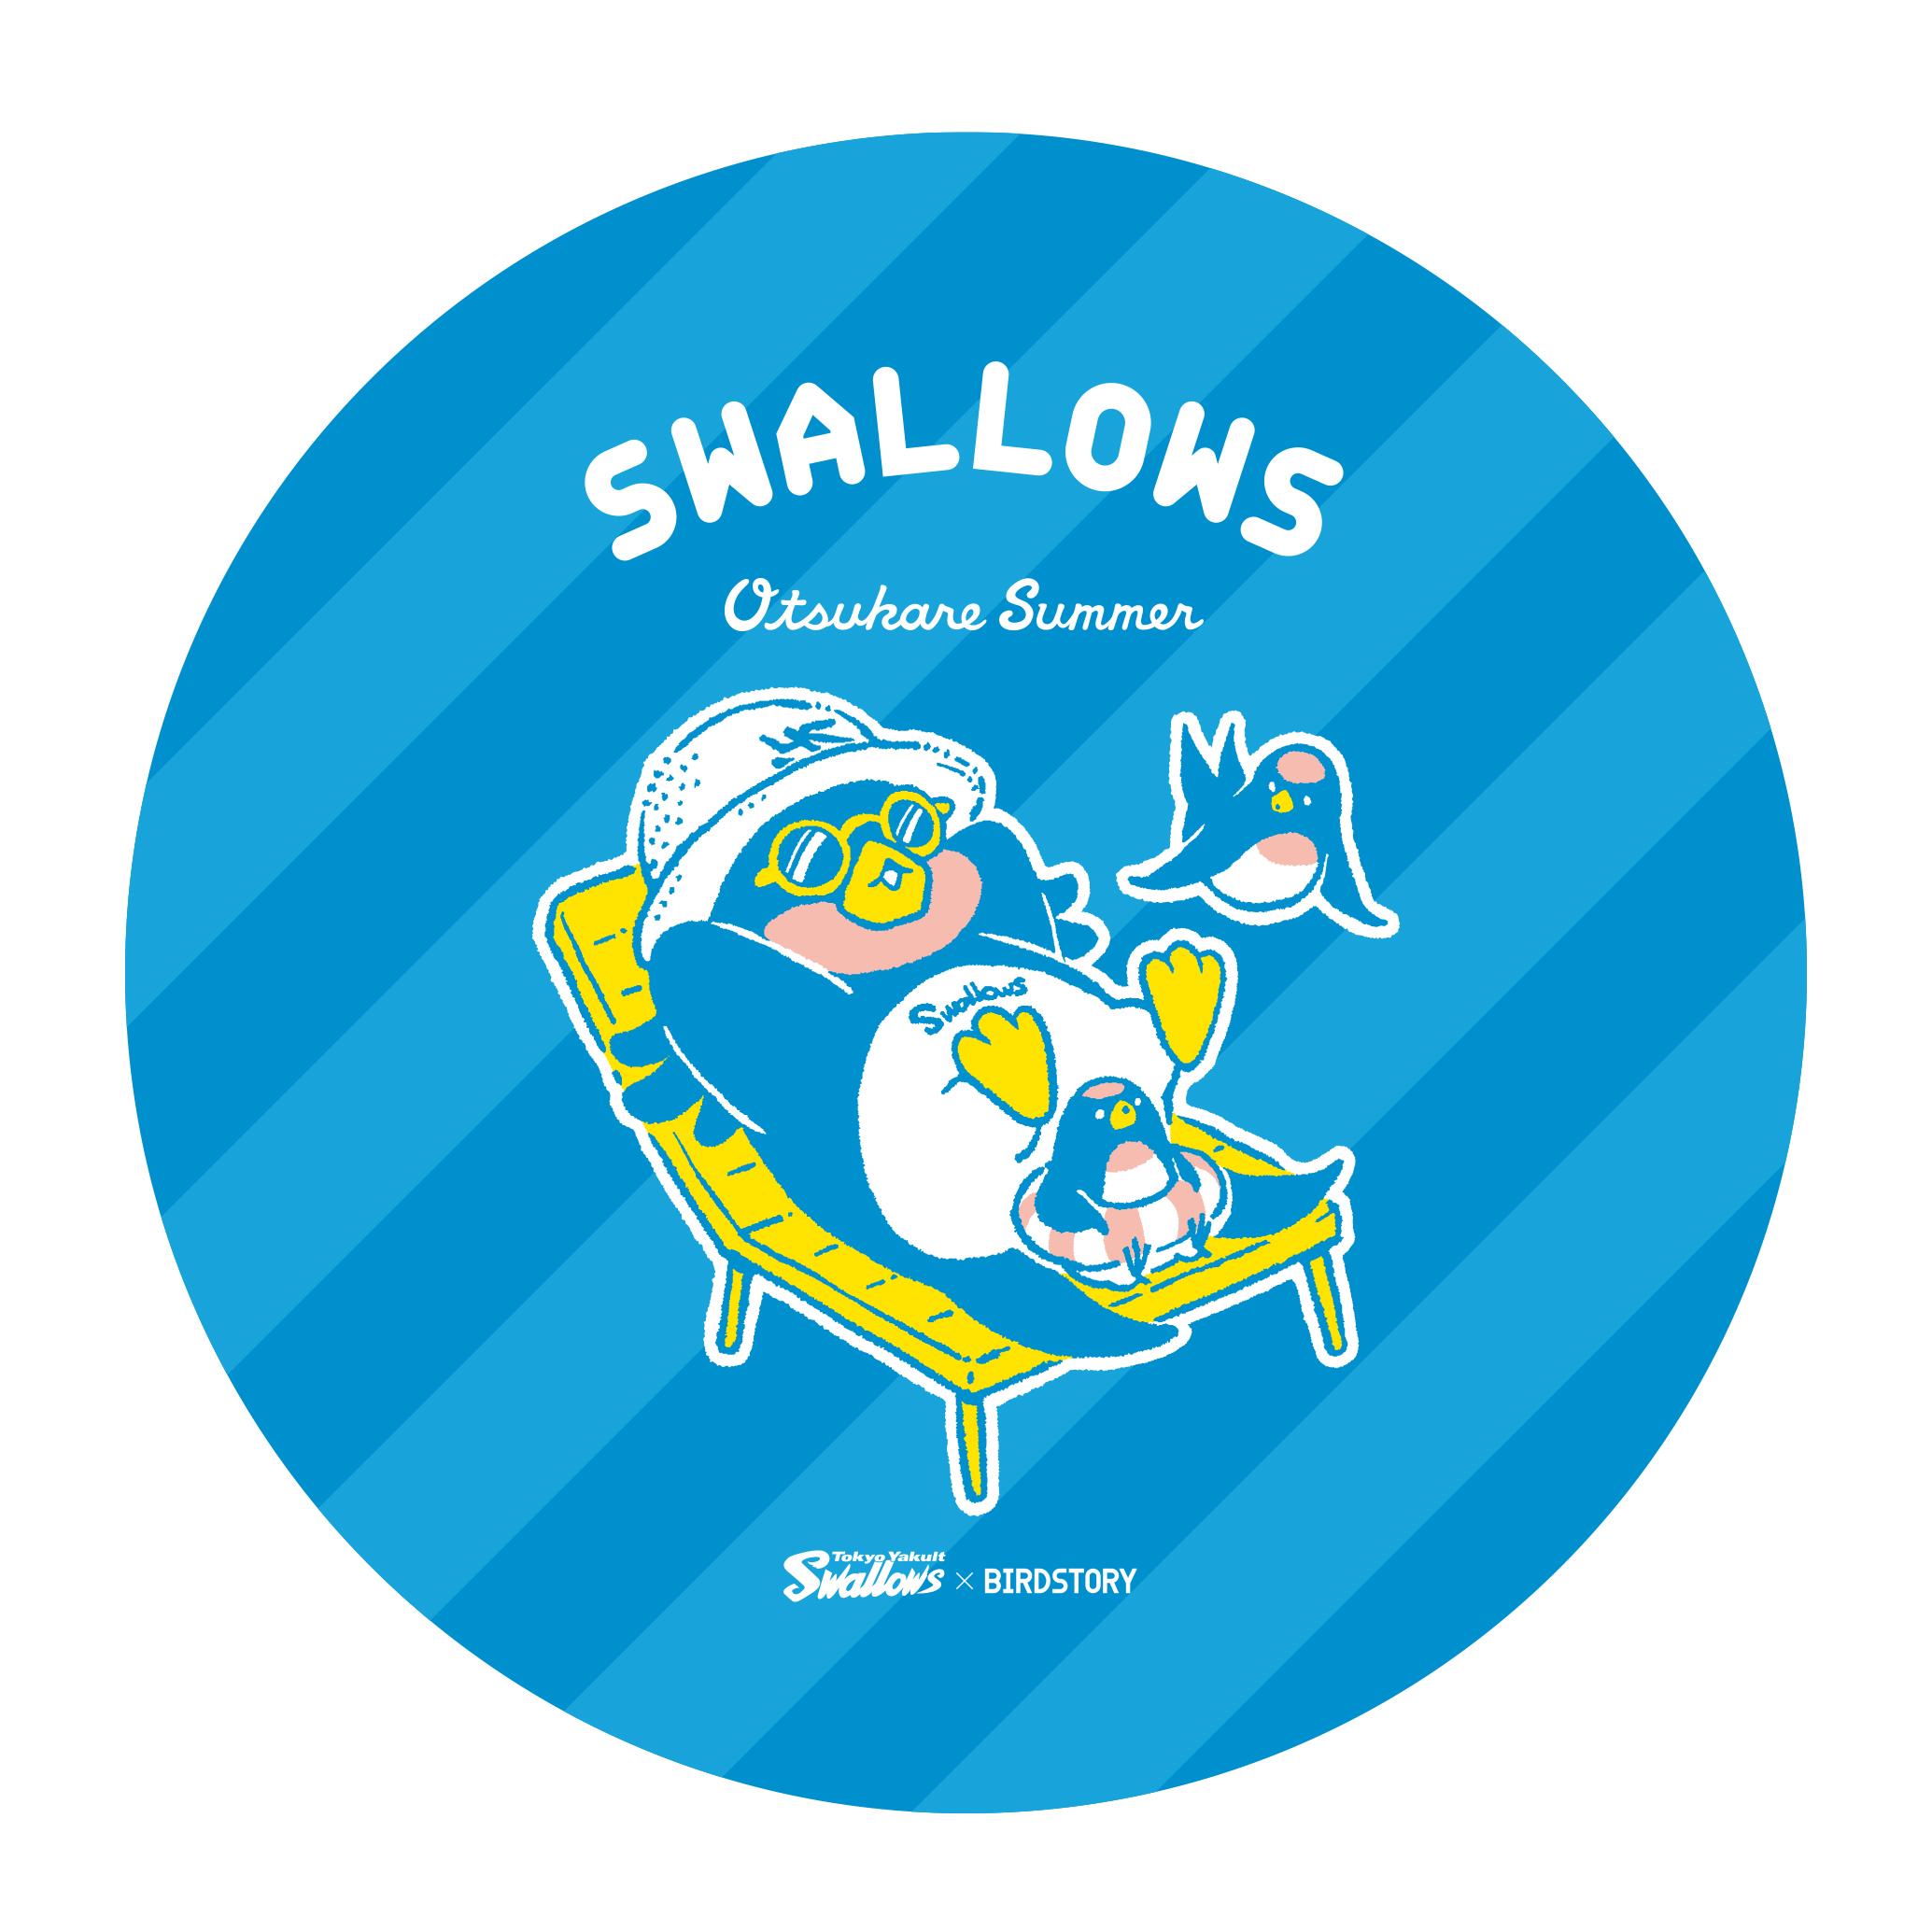 SWALLOWS×BIRDSTORY (ビーチ) ステッカー